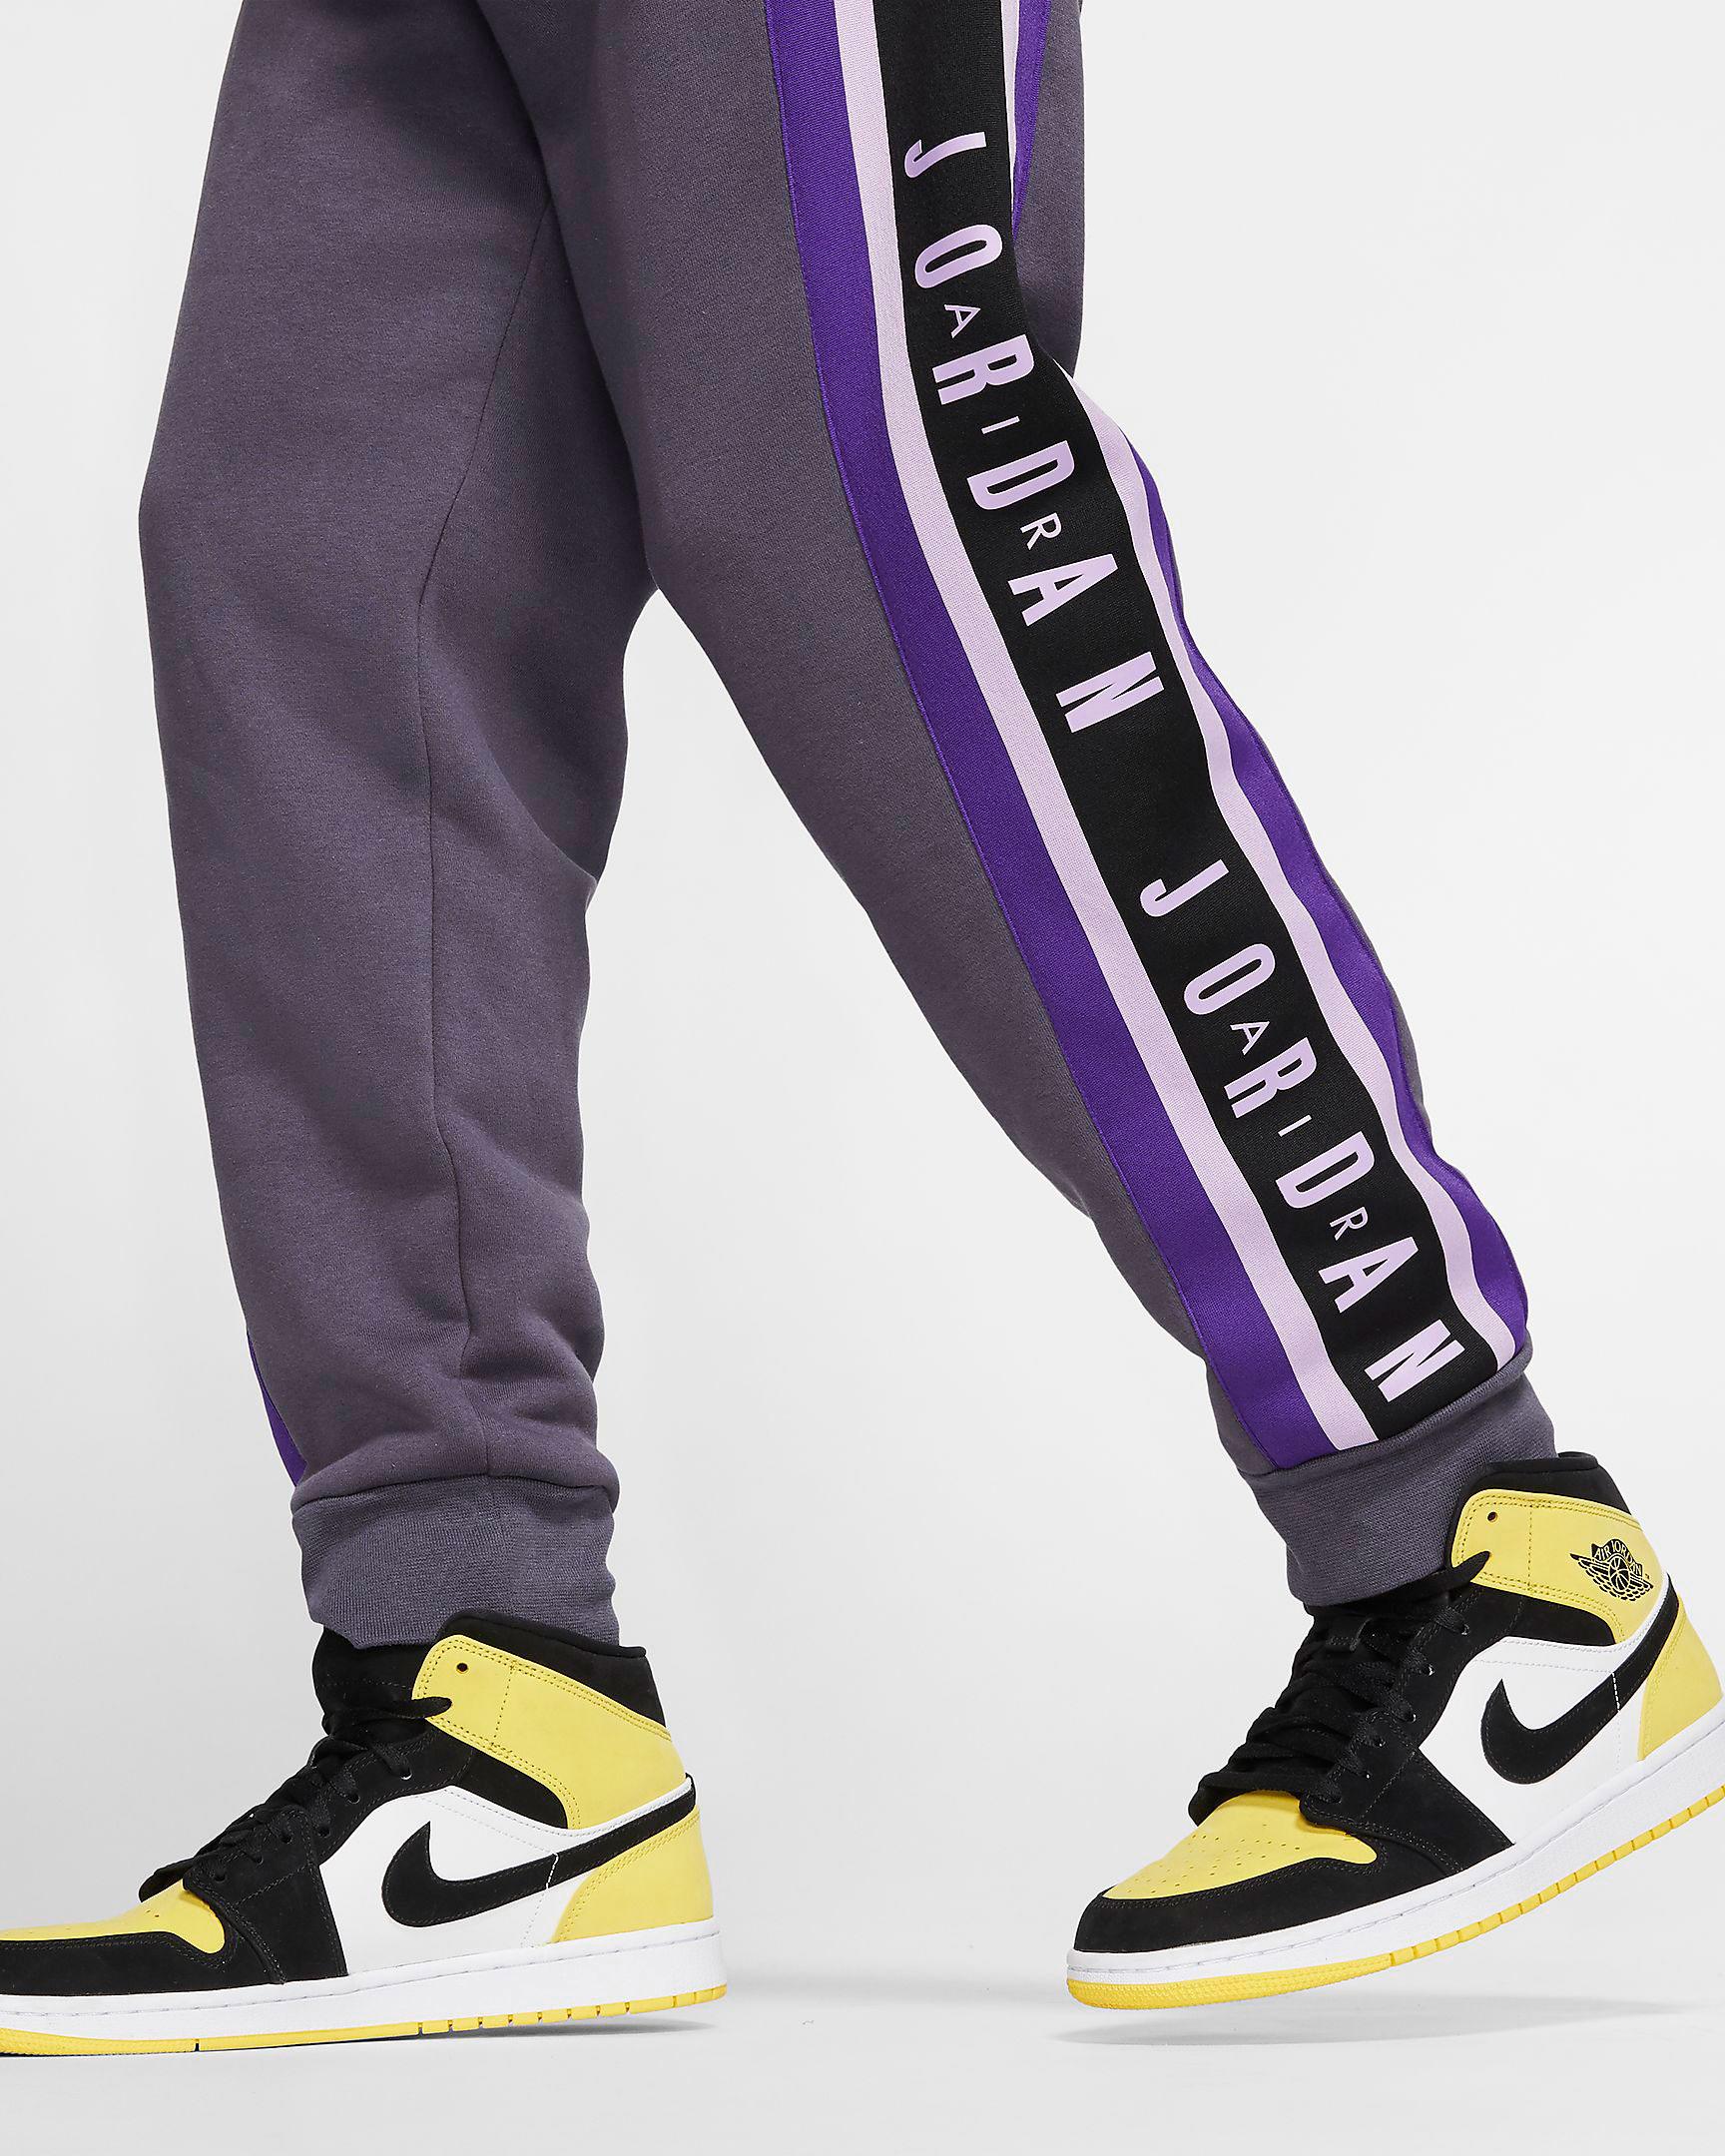 air-jordan-4-metallic-purple-pants-match-3